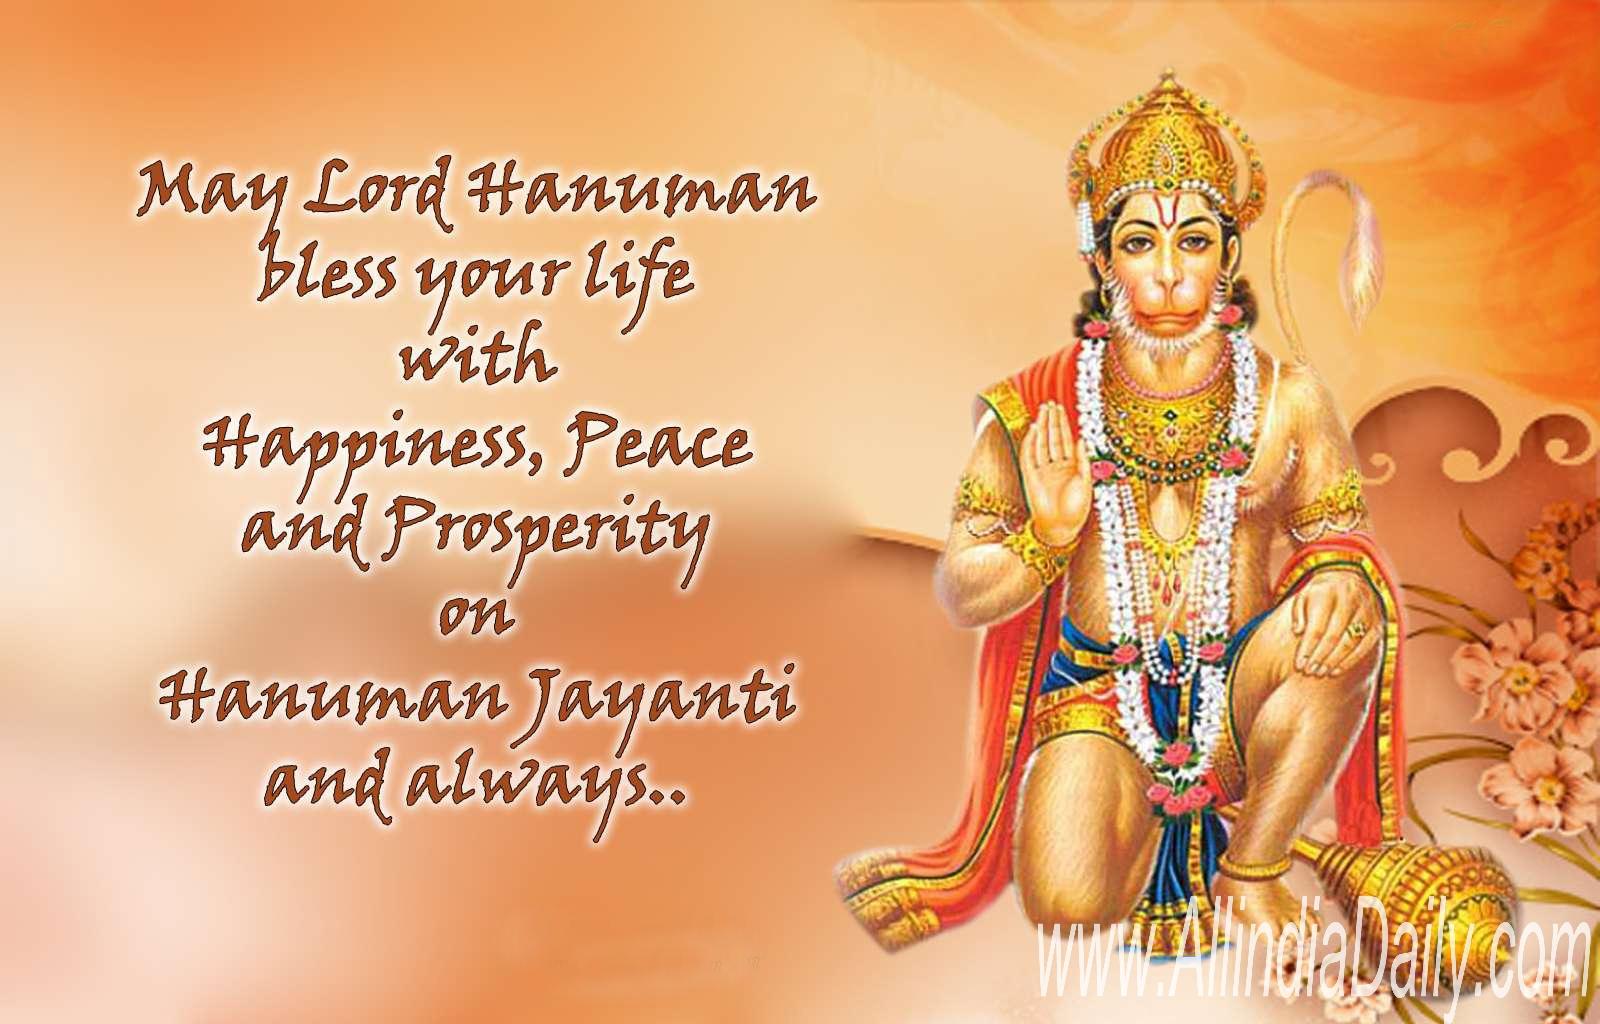 Happy Birthday Pooja Wallpaper Hd Hanuman Jayanti Wallpaper S All India Roundup